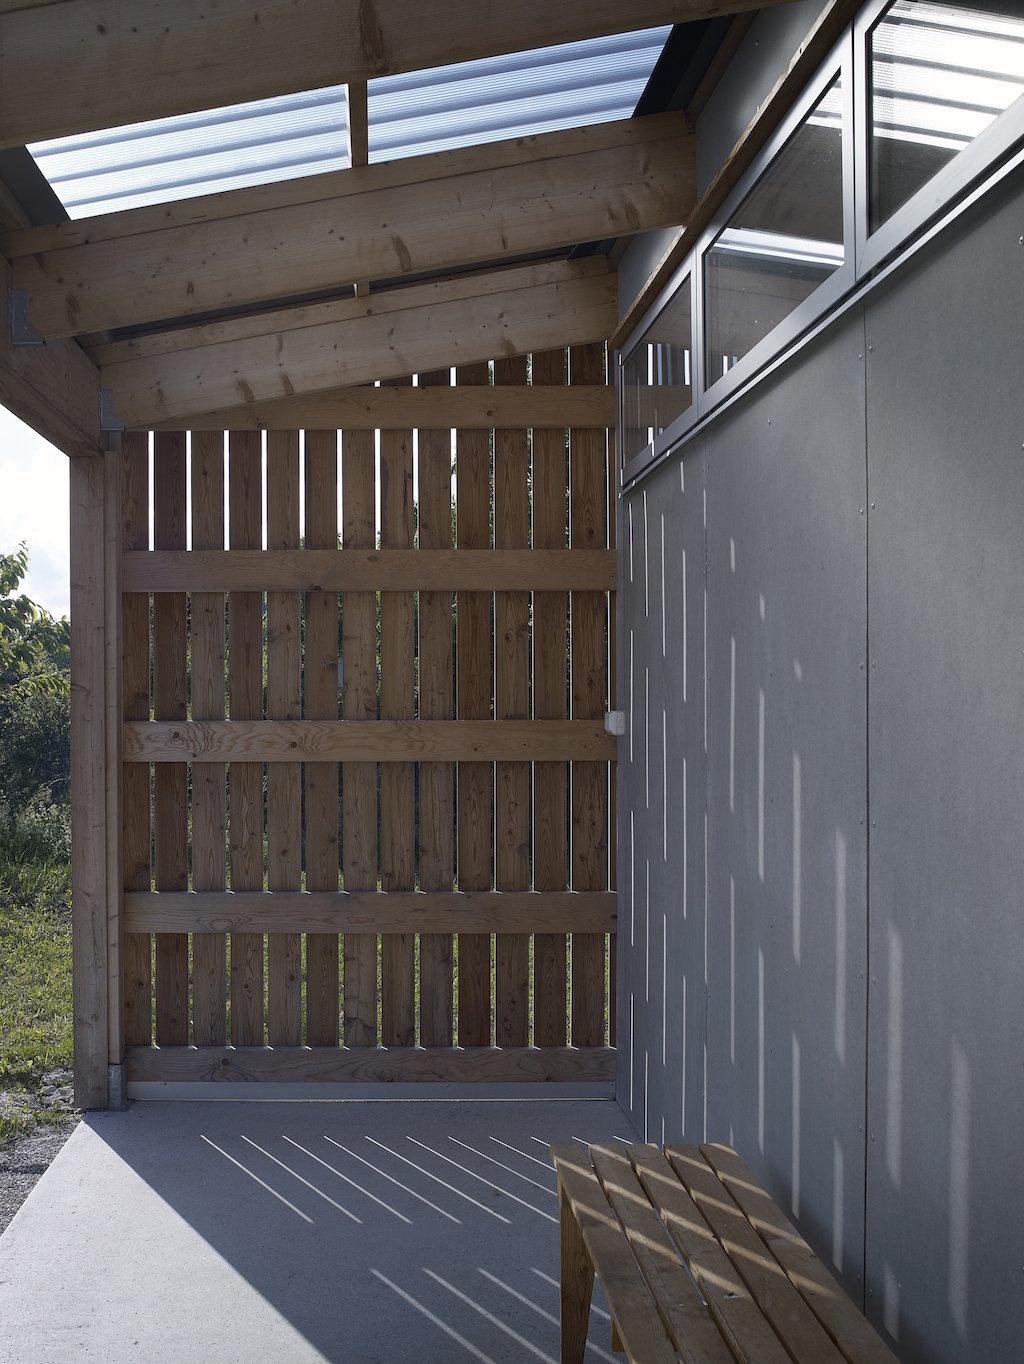 gammelgarn-attsarve-llp-arkitektkontor-2